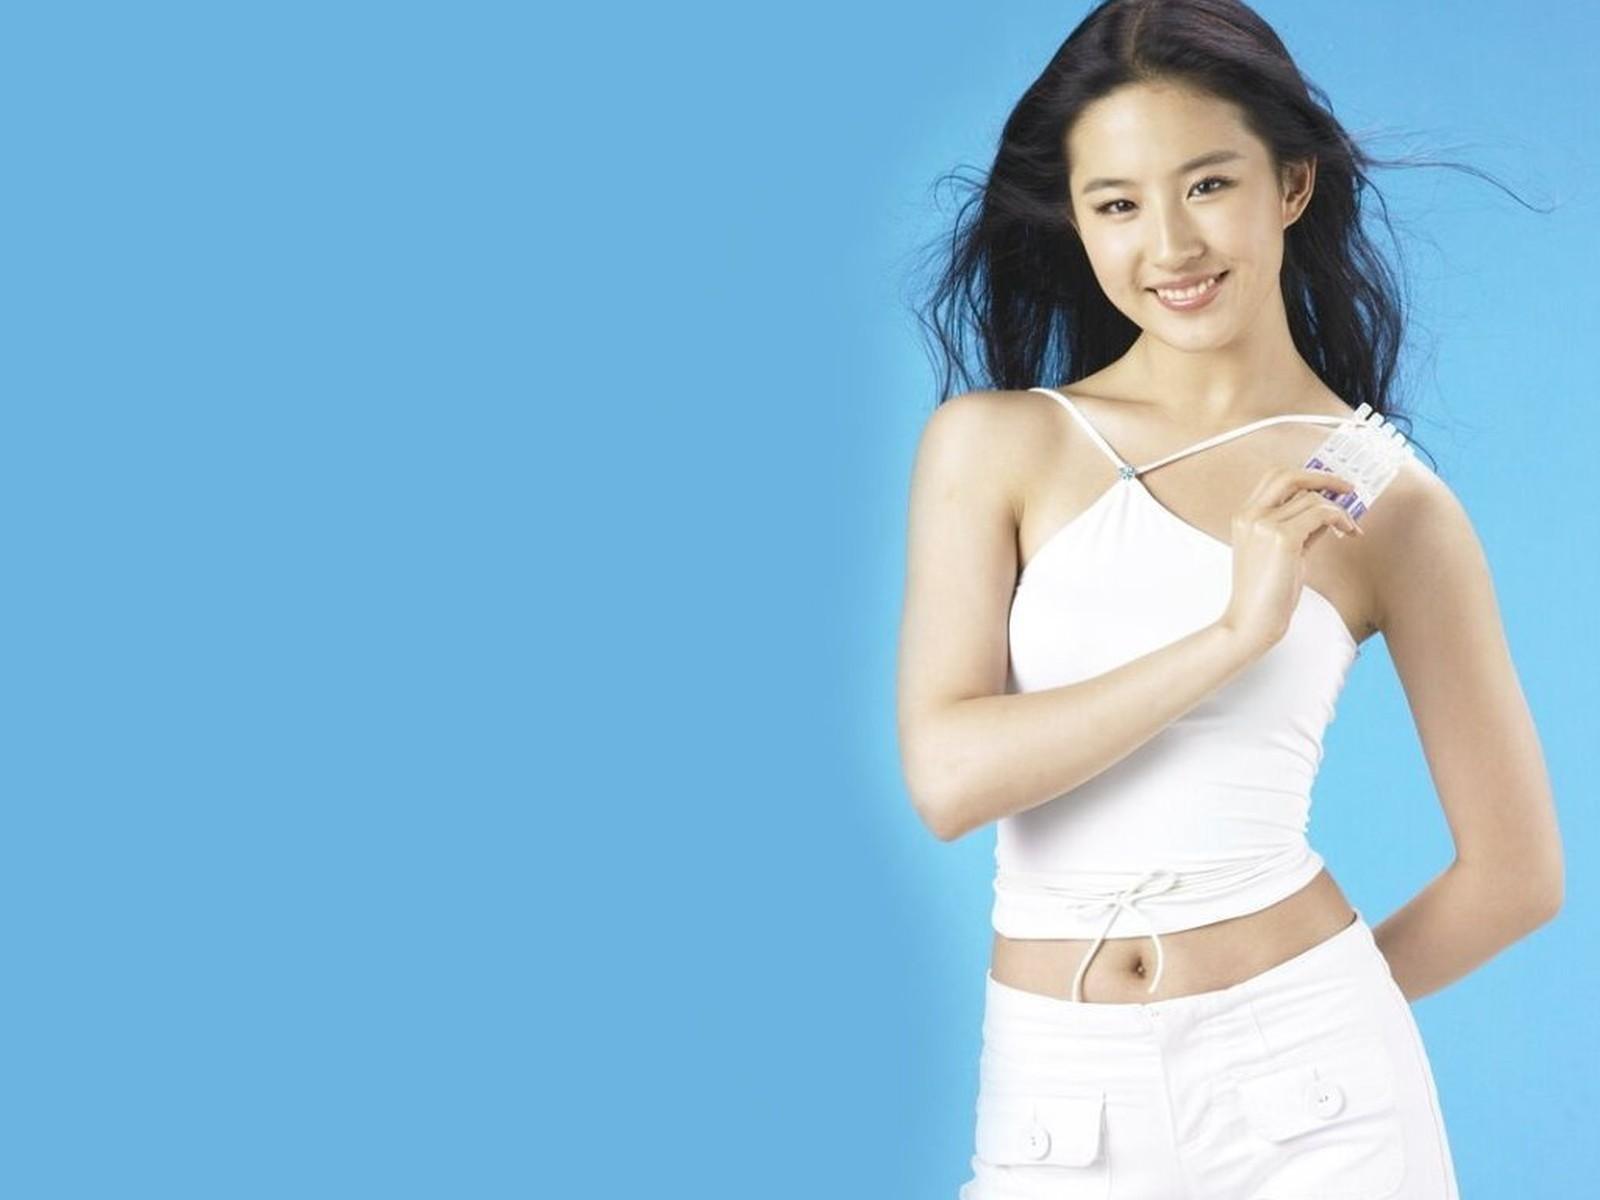 Sorry, can Liu yi fei nipples what here